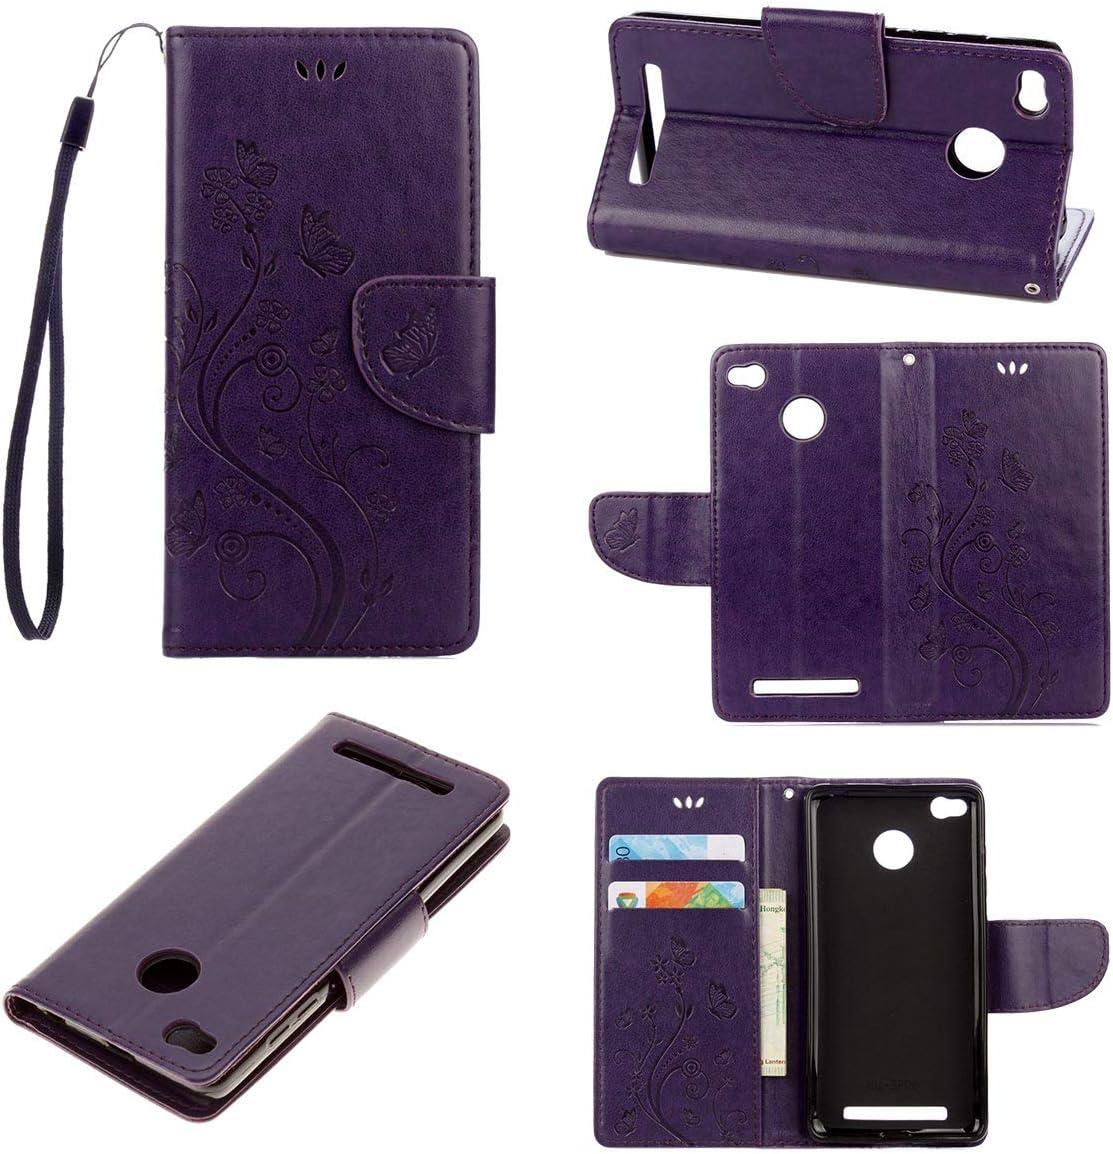 tinyue® Xiaomi Redmi 3 / Redmi3 Pro Funda, Cubierta de Billetera de Cuero PU Tapa abatible Funda, Mariposa en Relieve de Vid Cover, para Xiaomi Redmi 3 / Redmi3 Pro, Púrpura